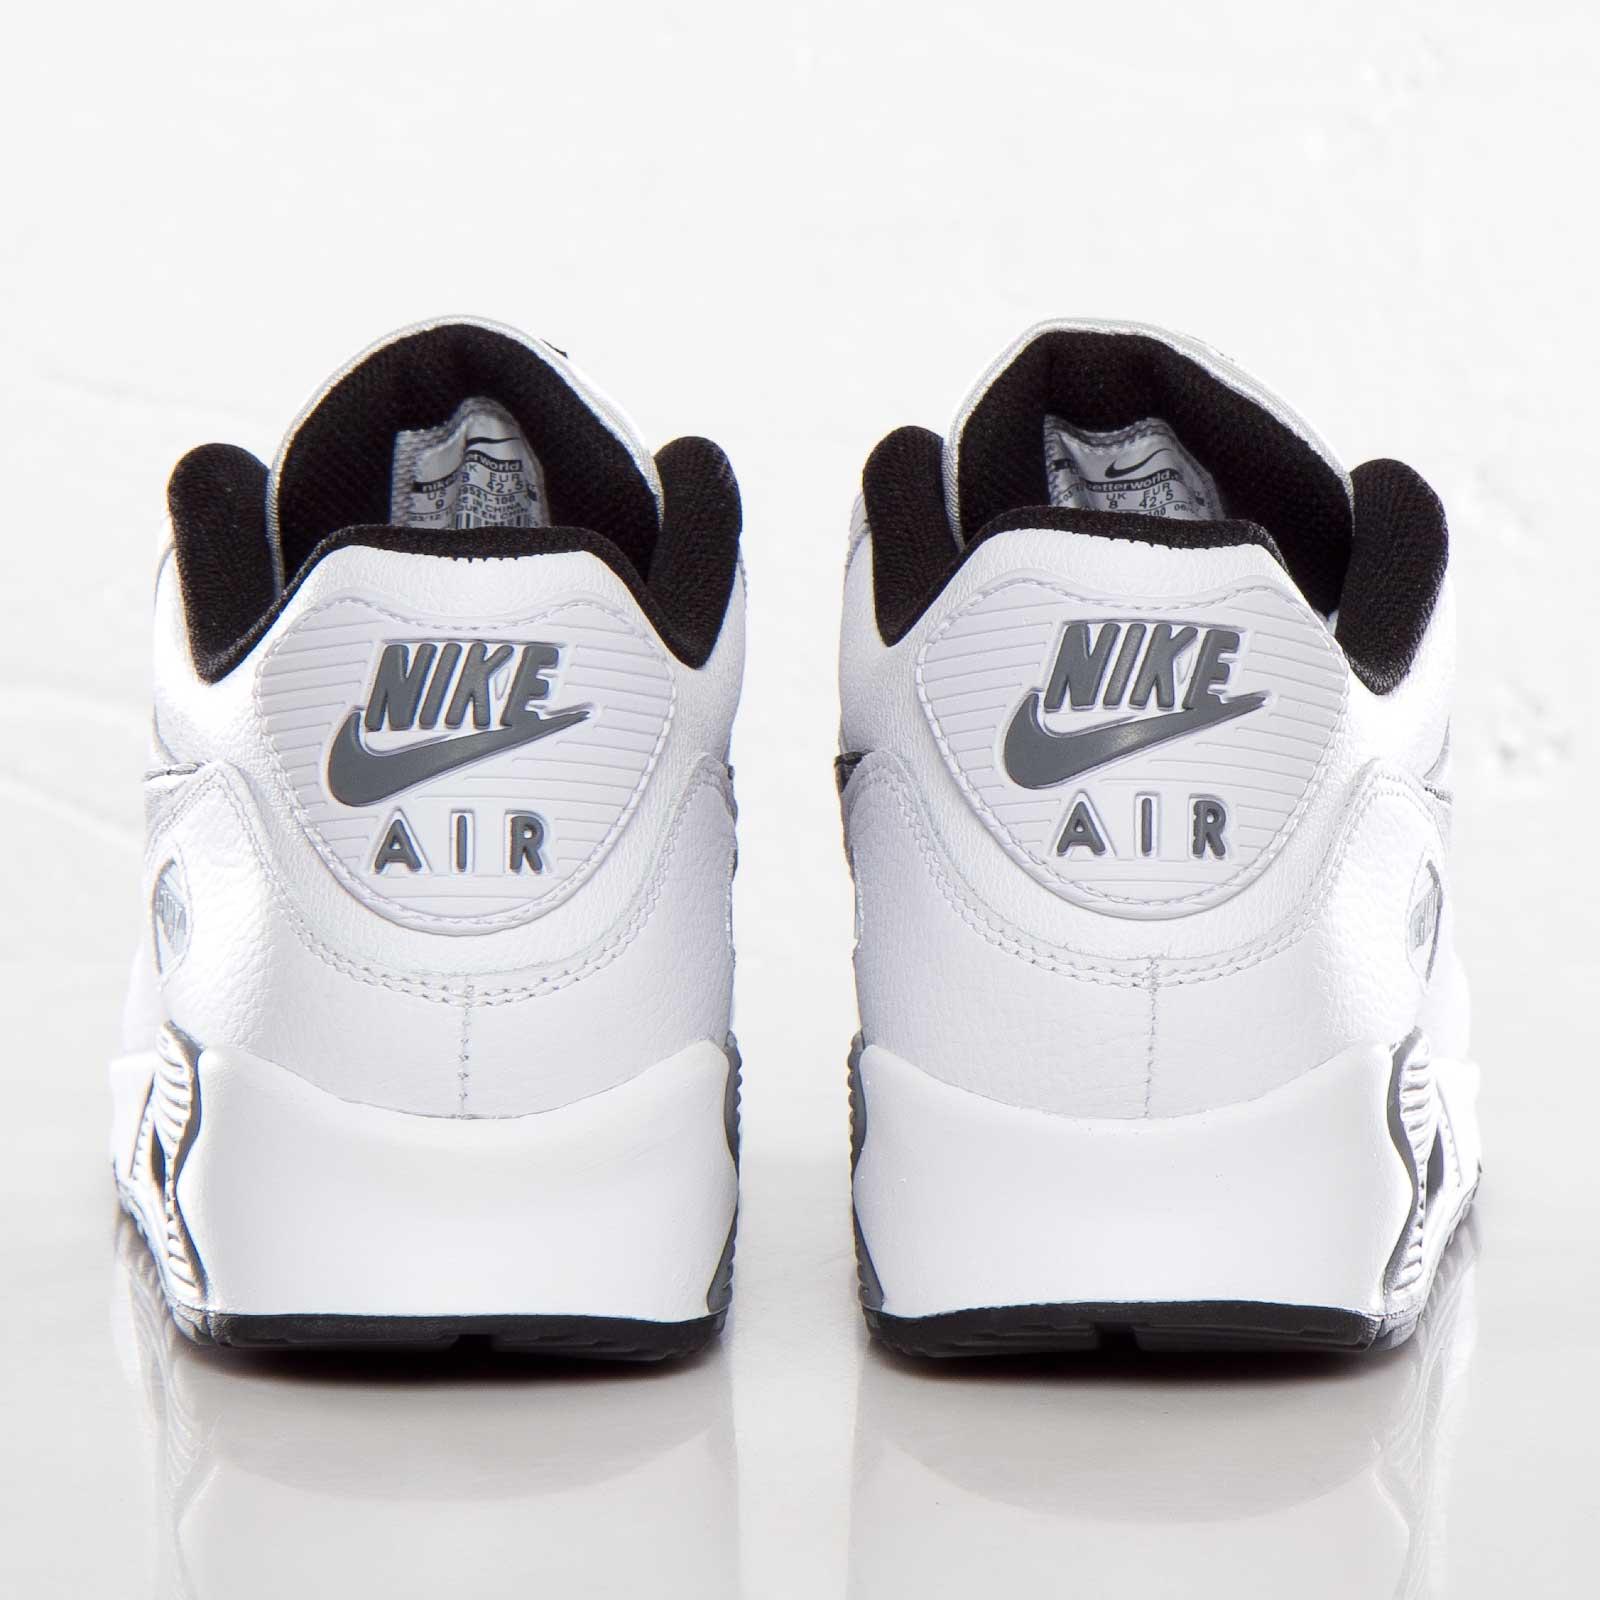 Air Max 90 Essential LTR Nike 599521 100 whiteblack